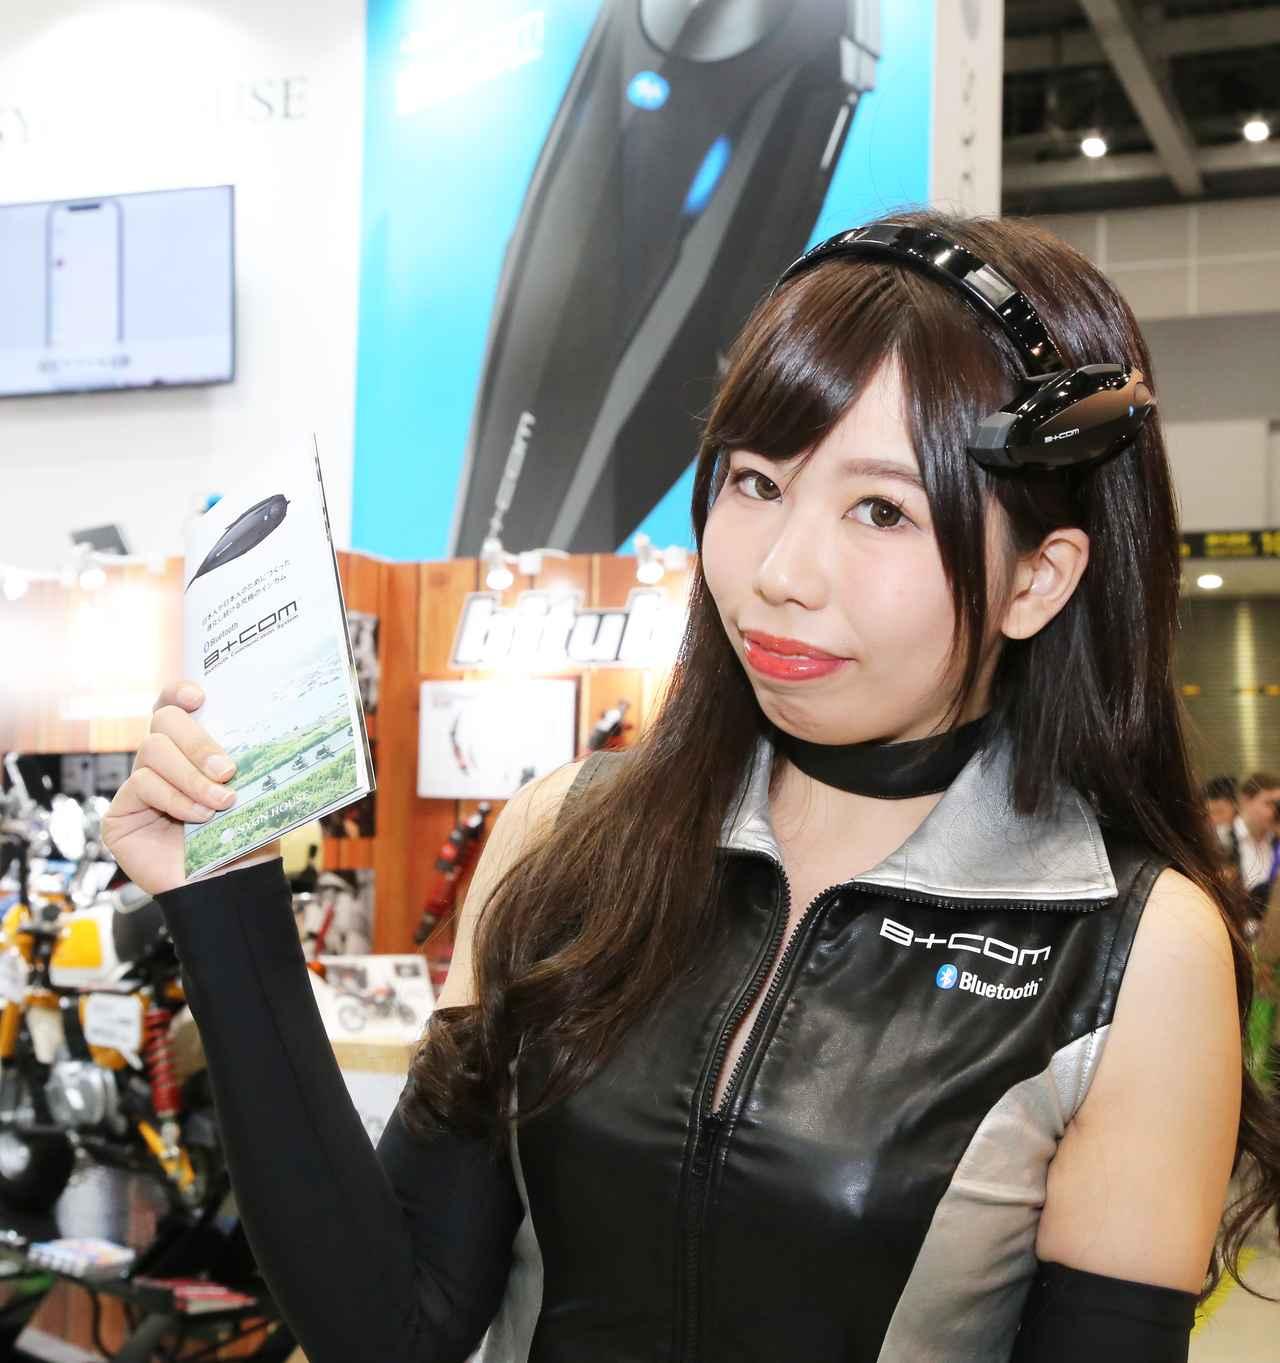 Images : 25番目の画像 - TMCS2019 美女コンパニオン図鑑! - webオートバイ